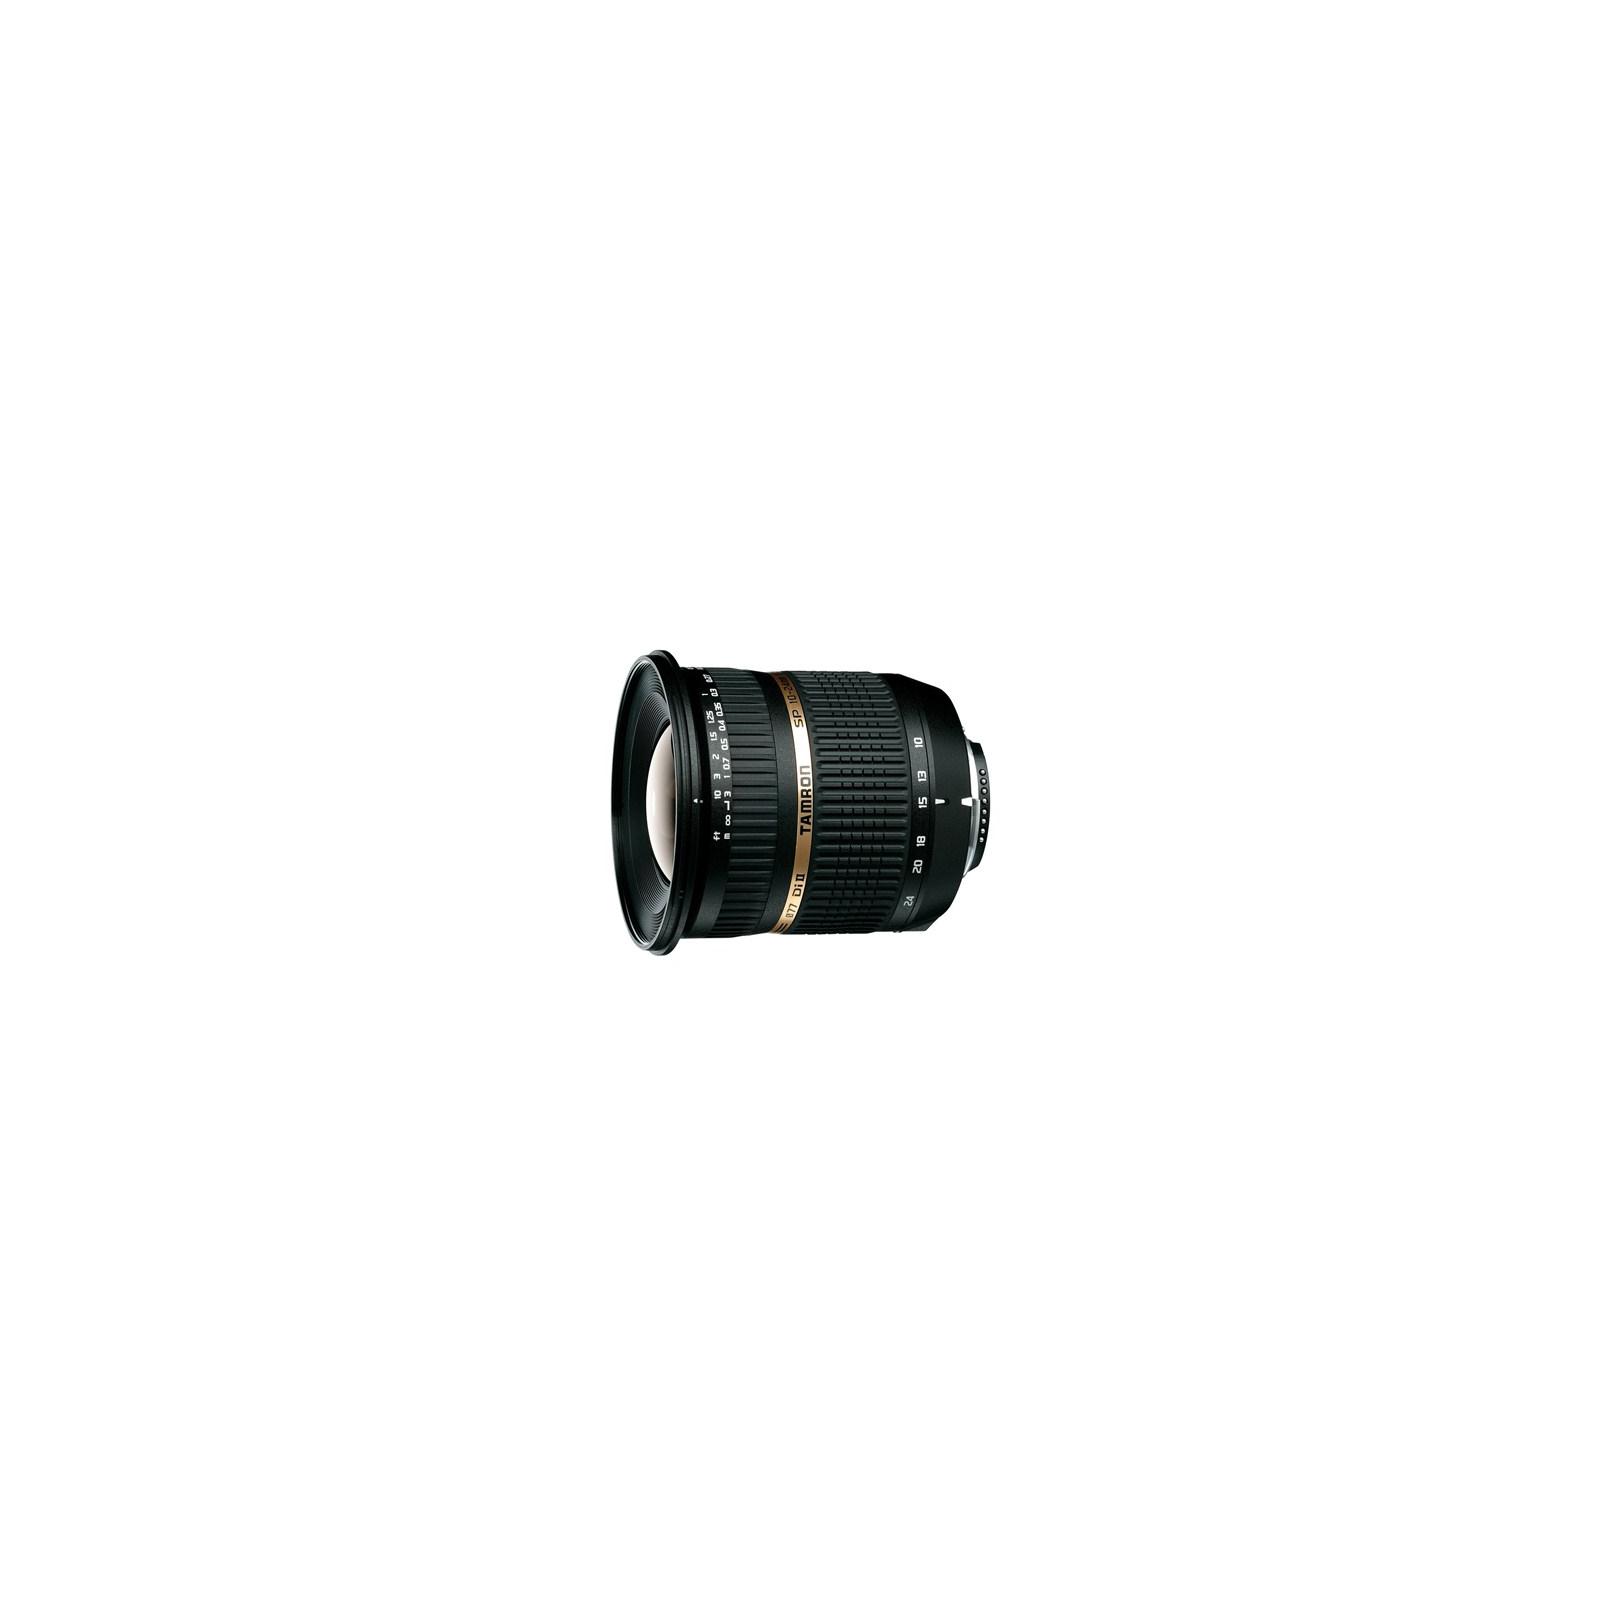 Объектив Tamron SP AF 10-24mm f/3.5-4.5 Di II LD Asp. (IF) for Nikon (SP AF 10-24mm for Nikon)